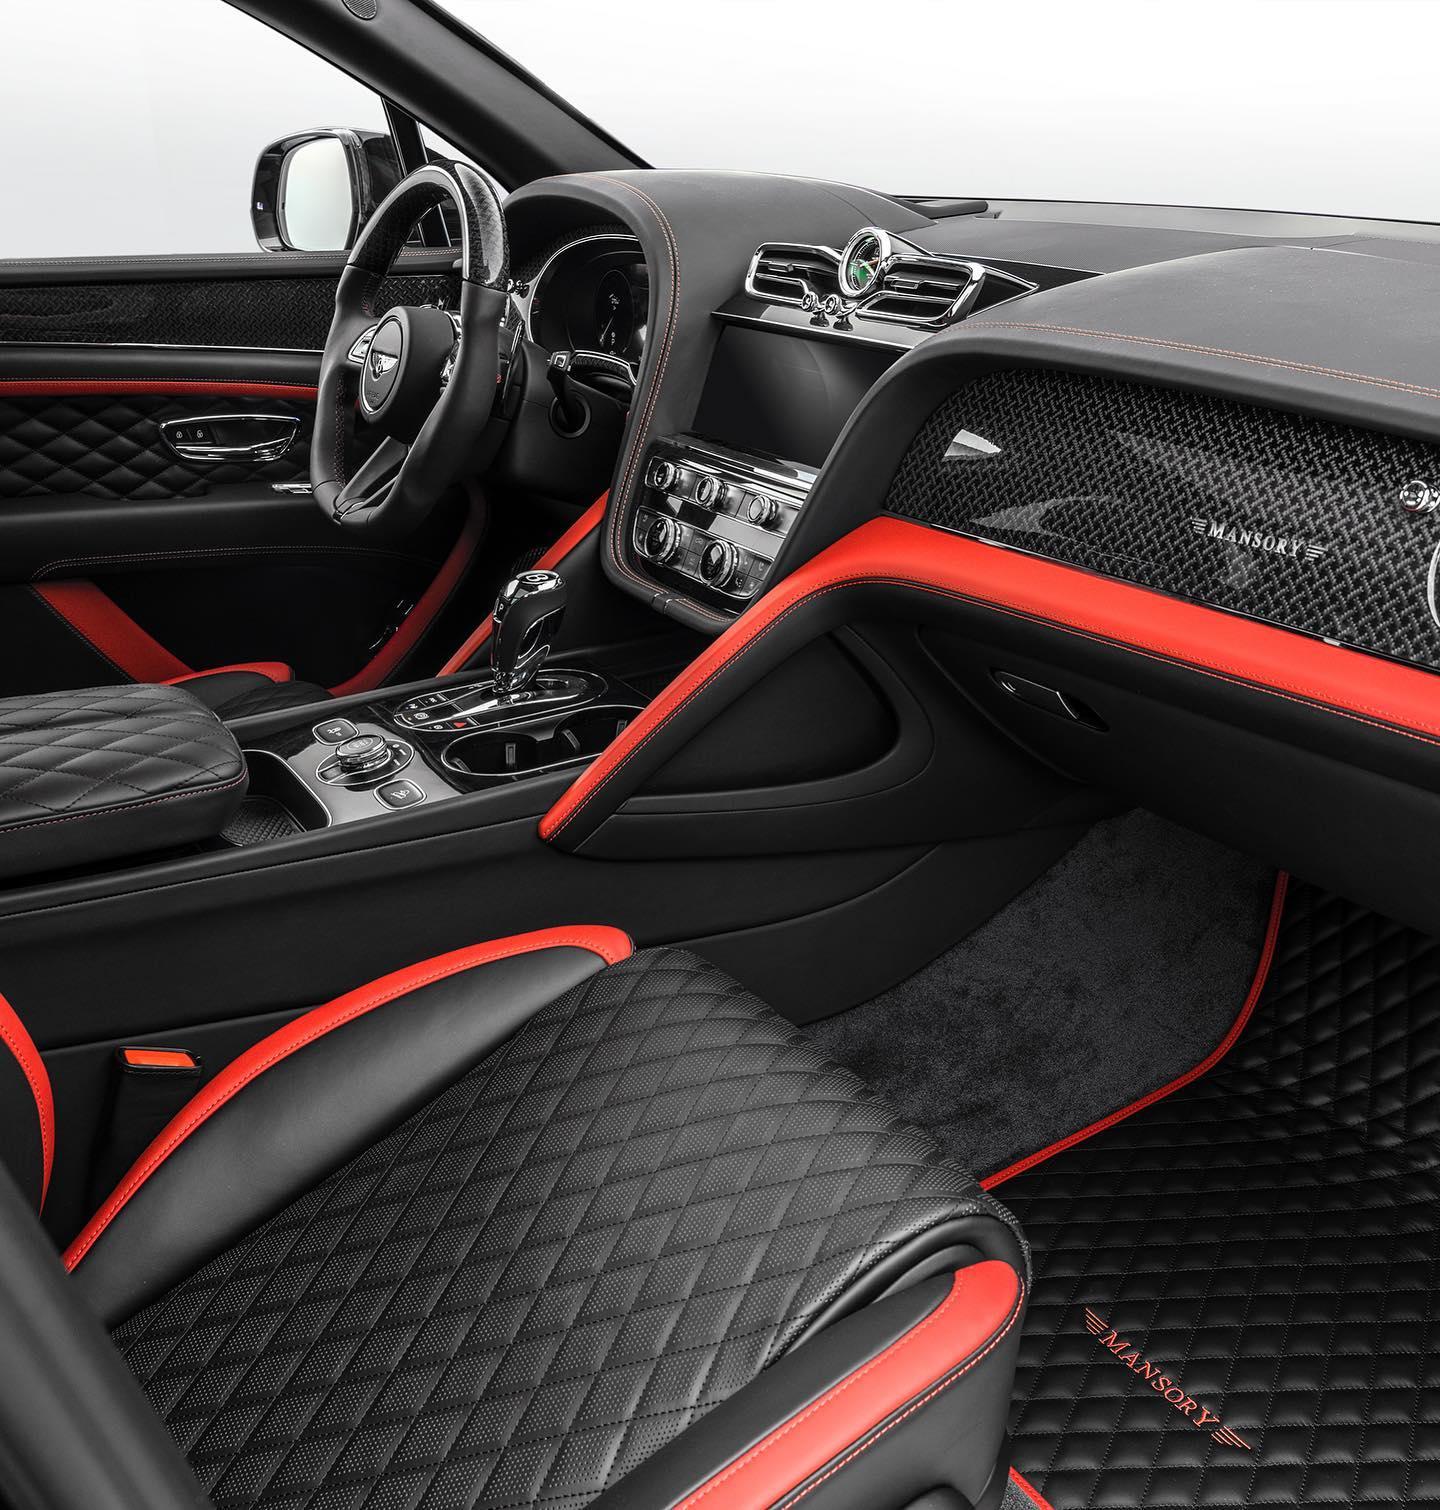 Bentley-Bentayga-Facelift-by-Mansory-15